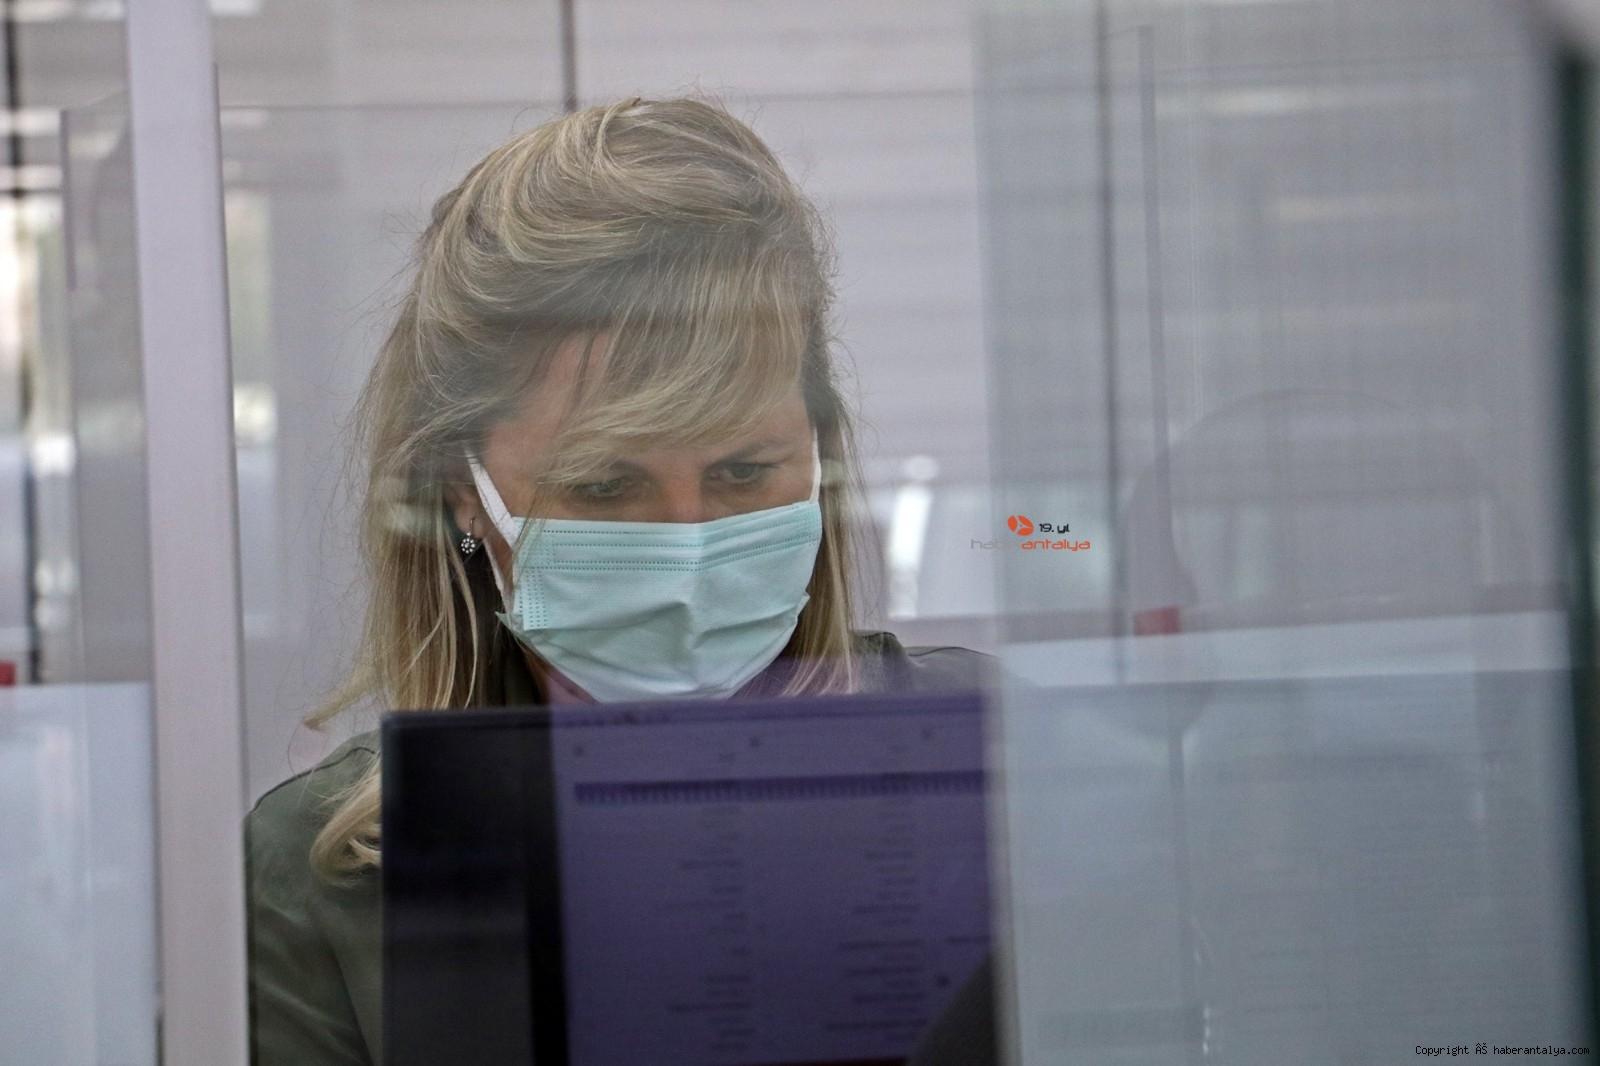 2021/04/koronavirus-asisina-ramazan-ayi-ayari-20210407AW28-6.jpg